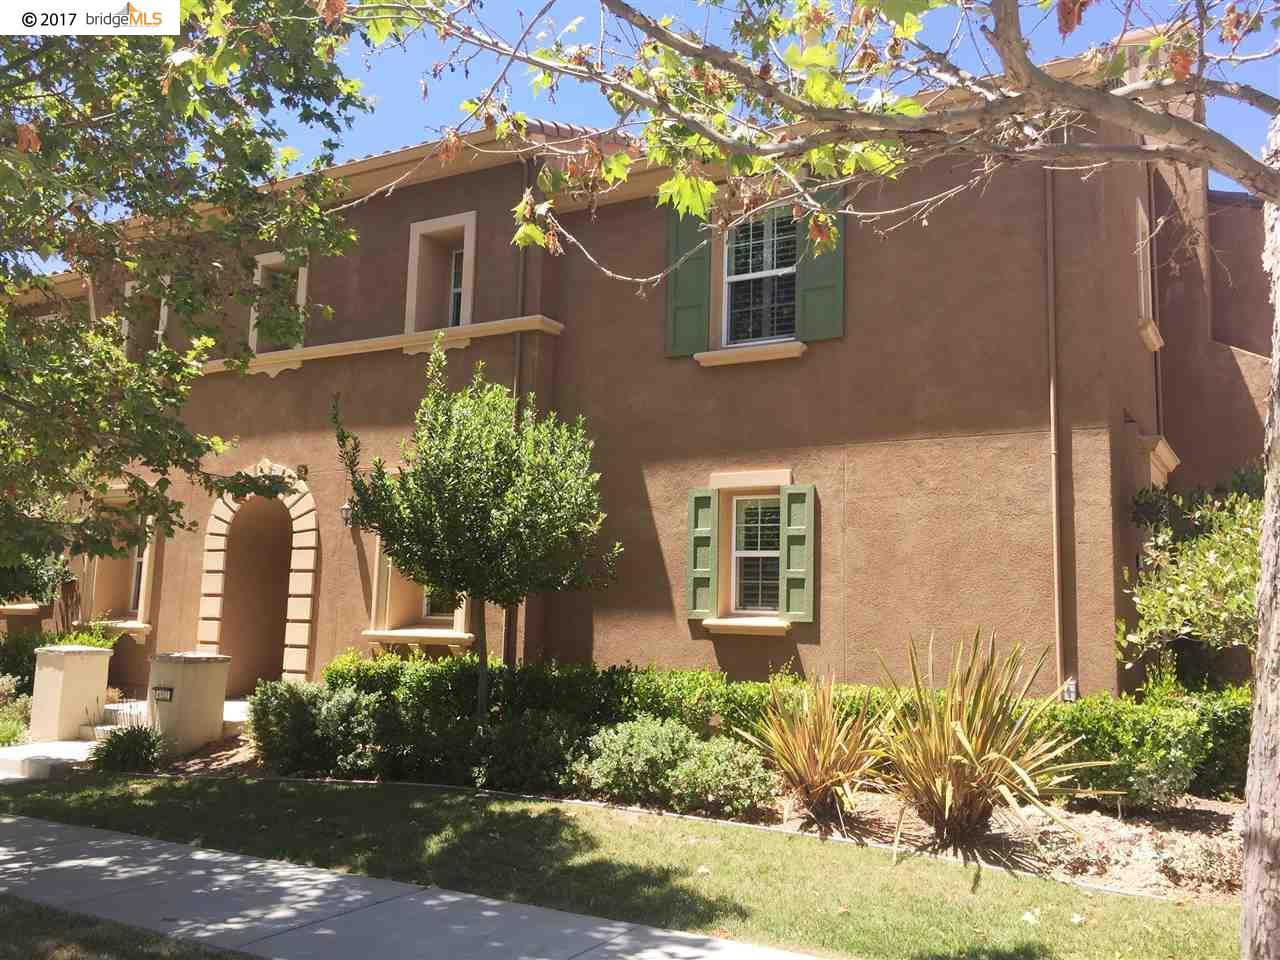 4936 Ivyleaf Springs Rd., SAN RAMON, CA 94582